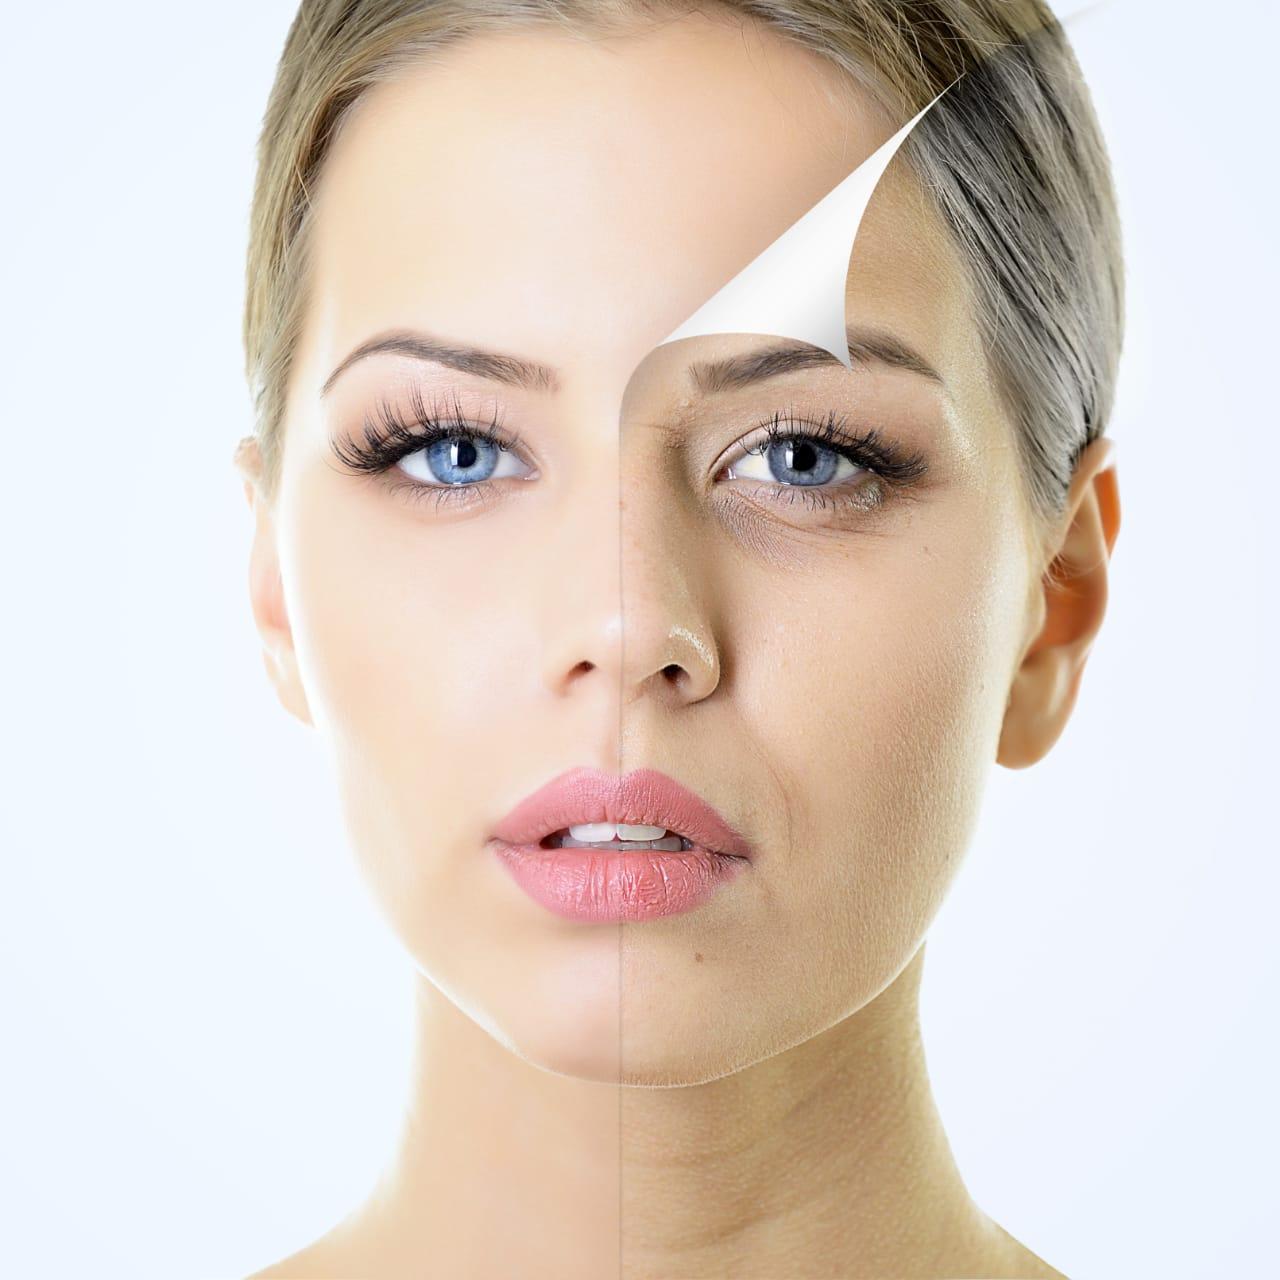 Best Skin Care Treatment For Wrinkles in Hyderabad by Dr Swapana Priya, skin dermatologist near me